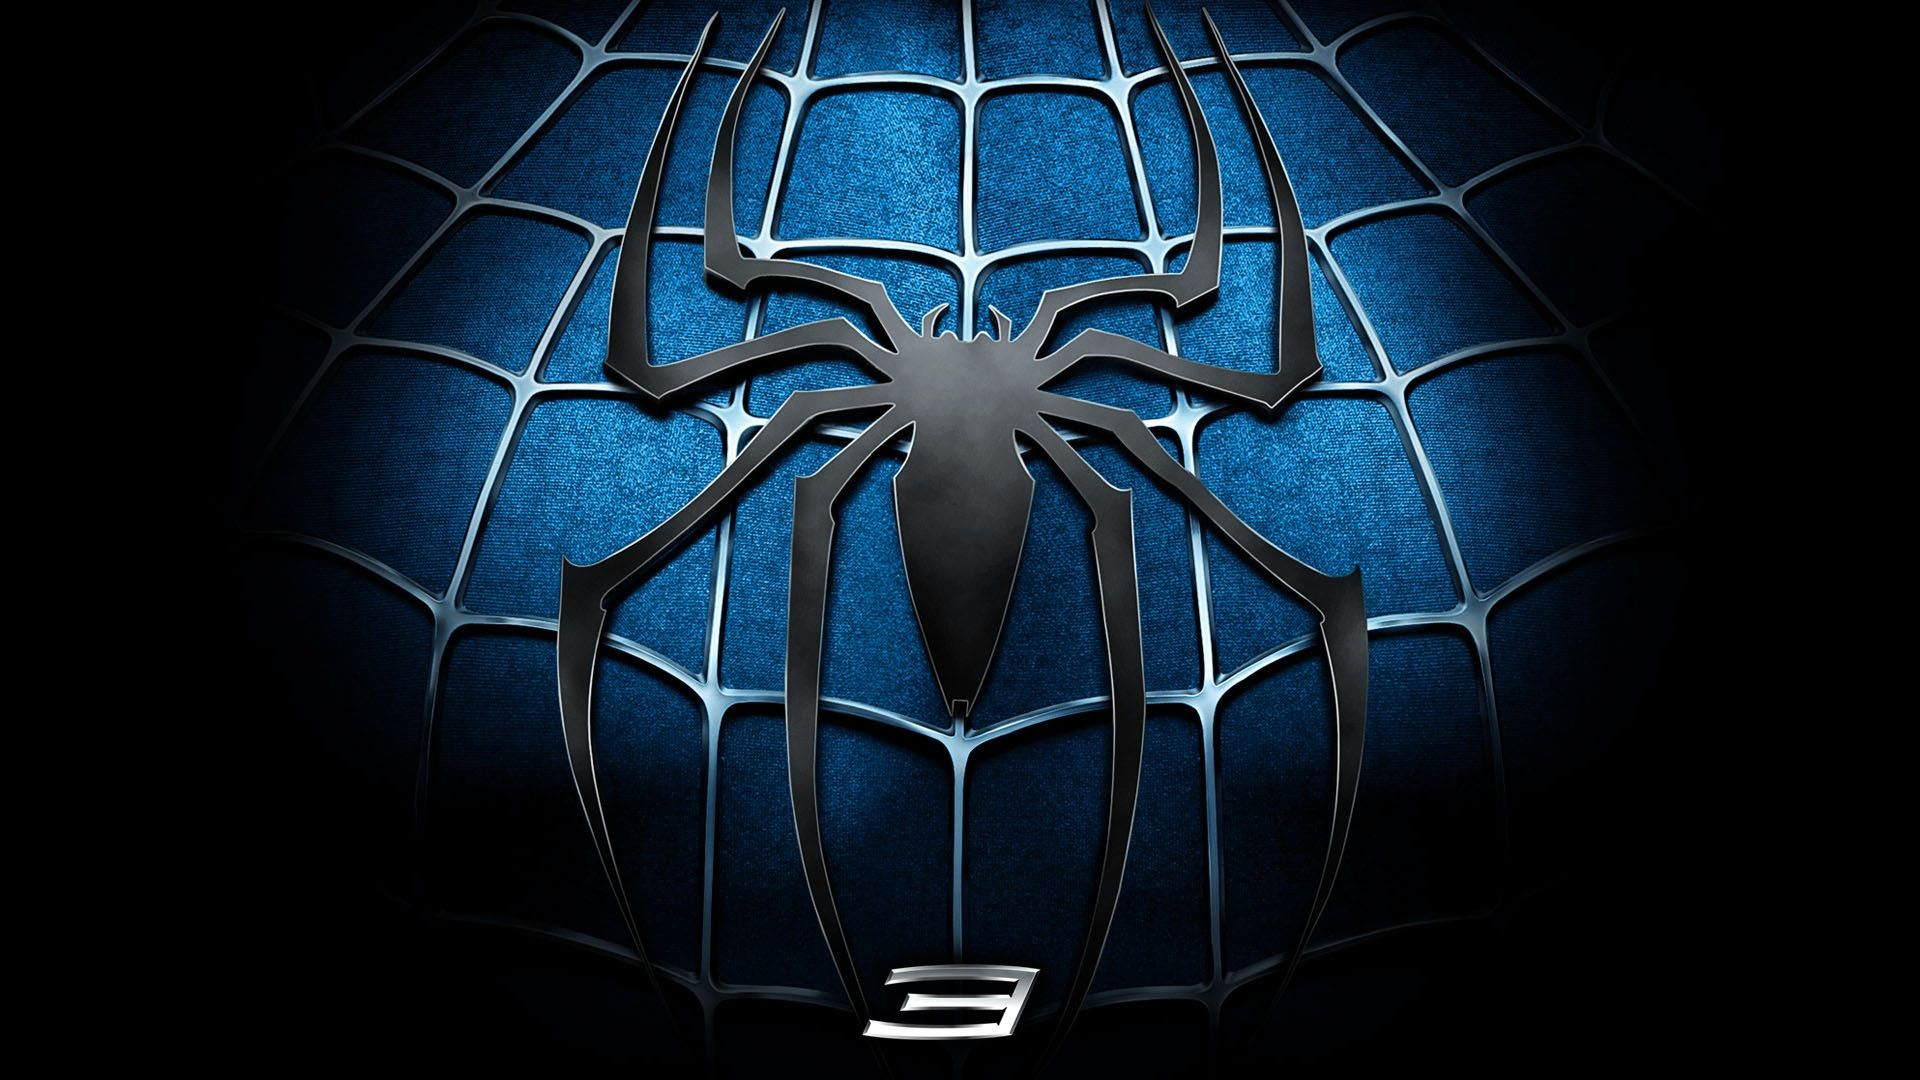 Image for Black Spiderman Logo Wallpaper Cool HD